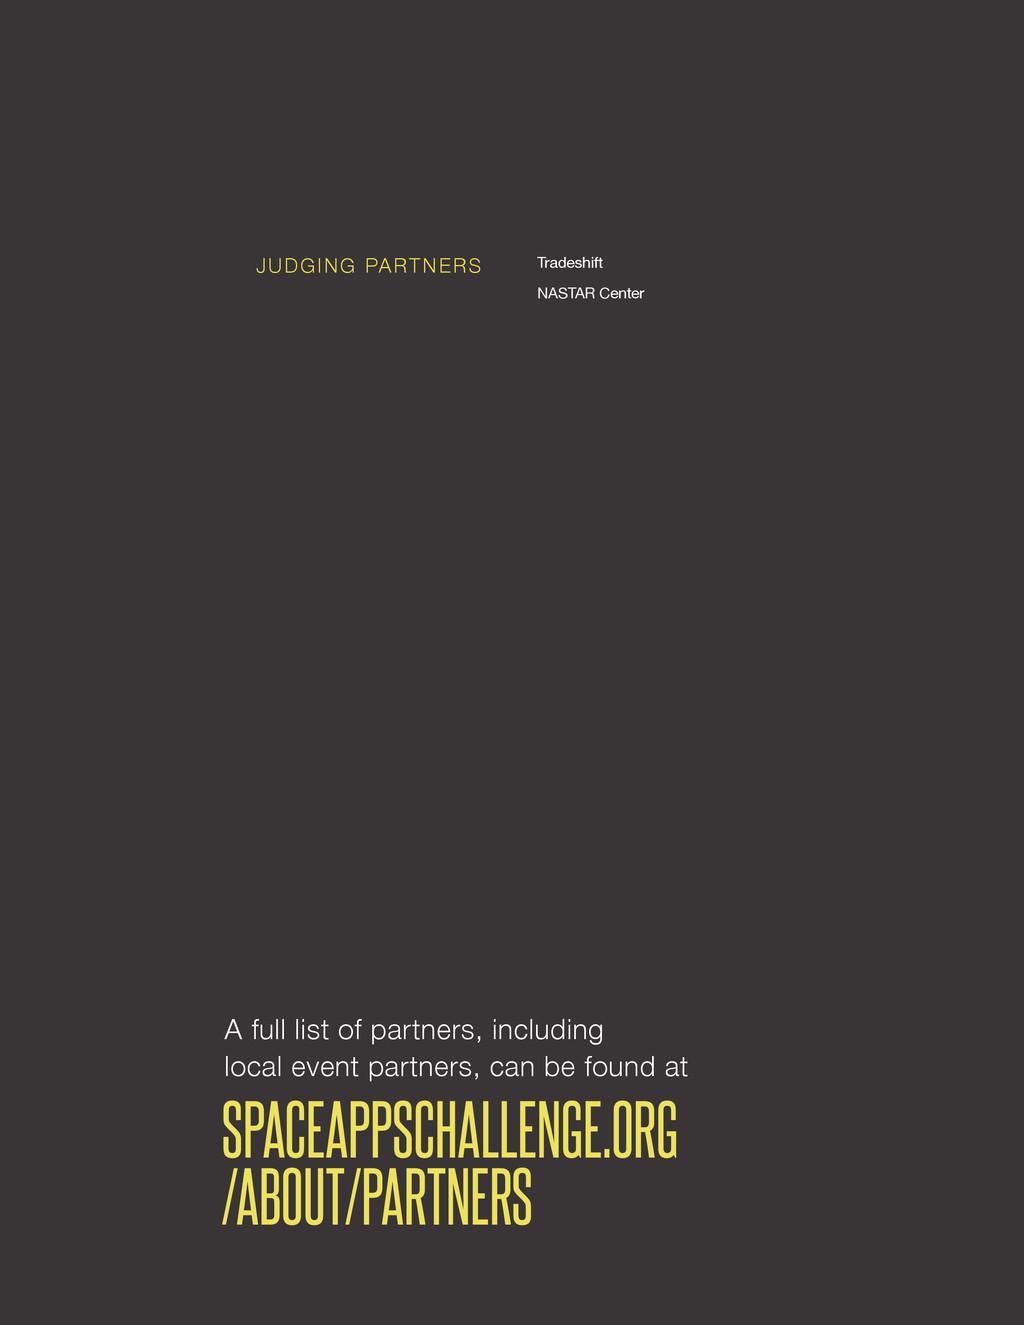 spaceappschallenge.org Tradeshift NASTAR Center...